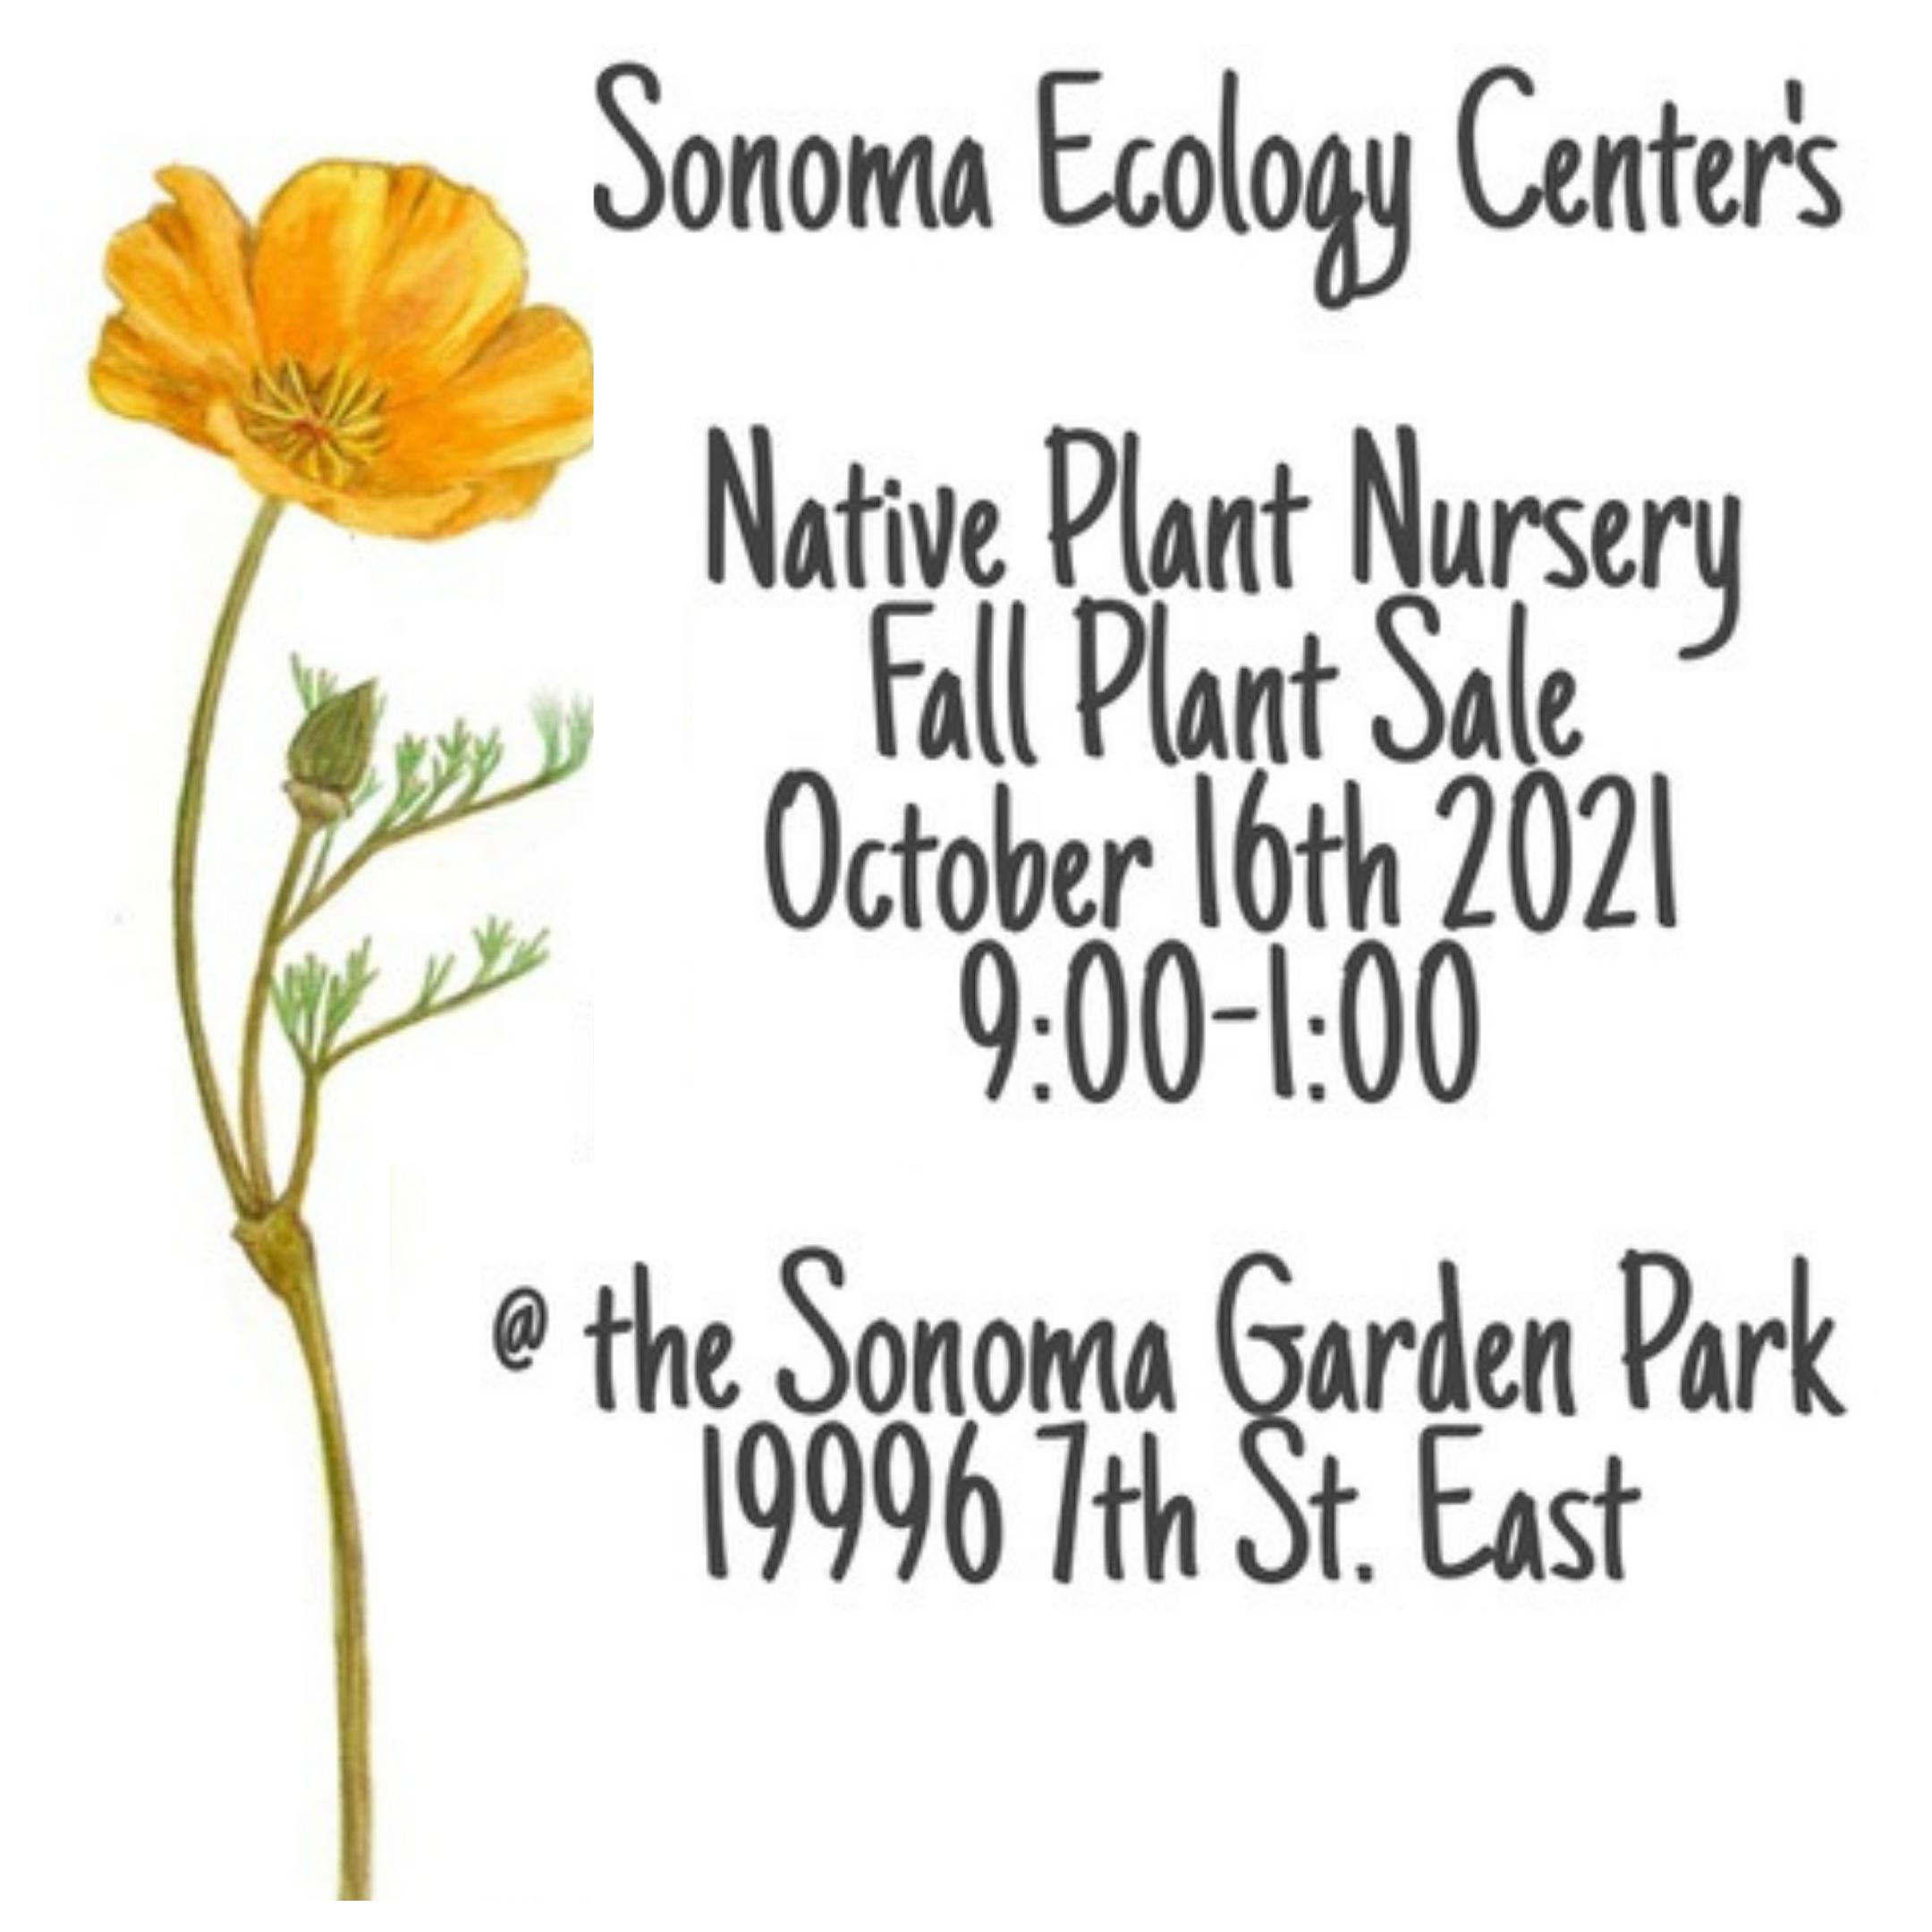 Native Plant Nursery Fall Plant Sale @ Sonoma Garden Park